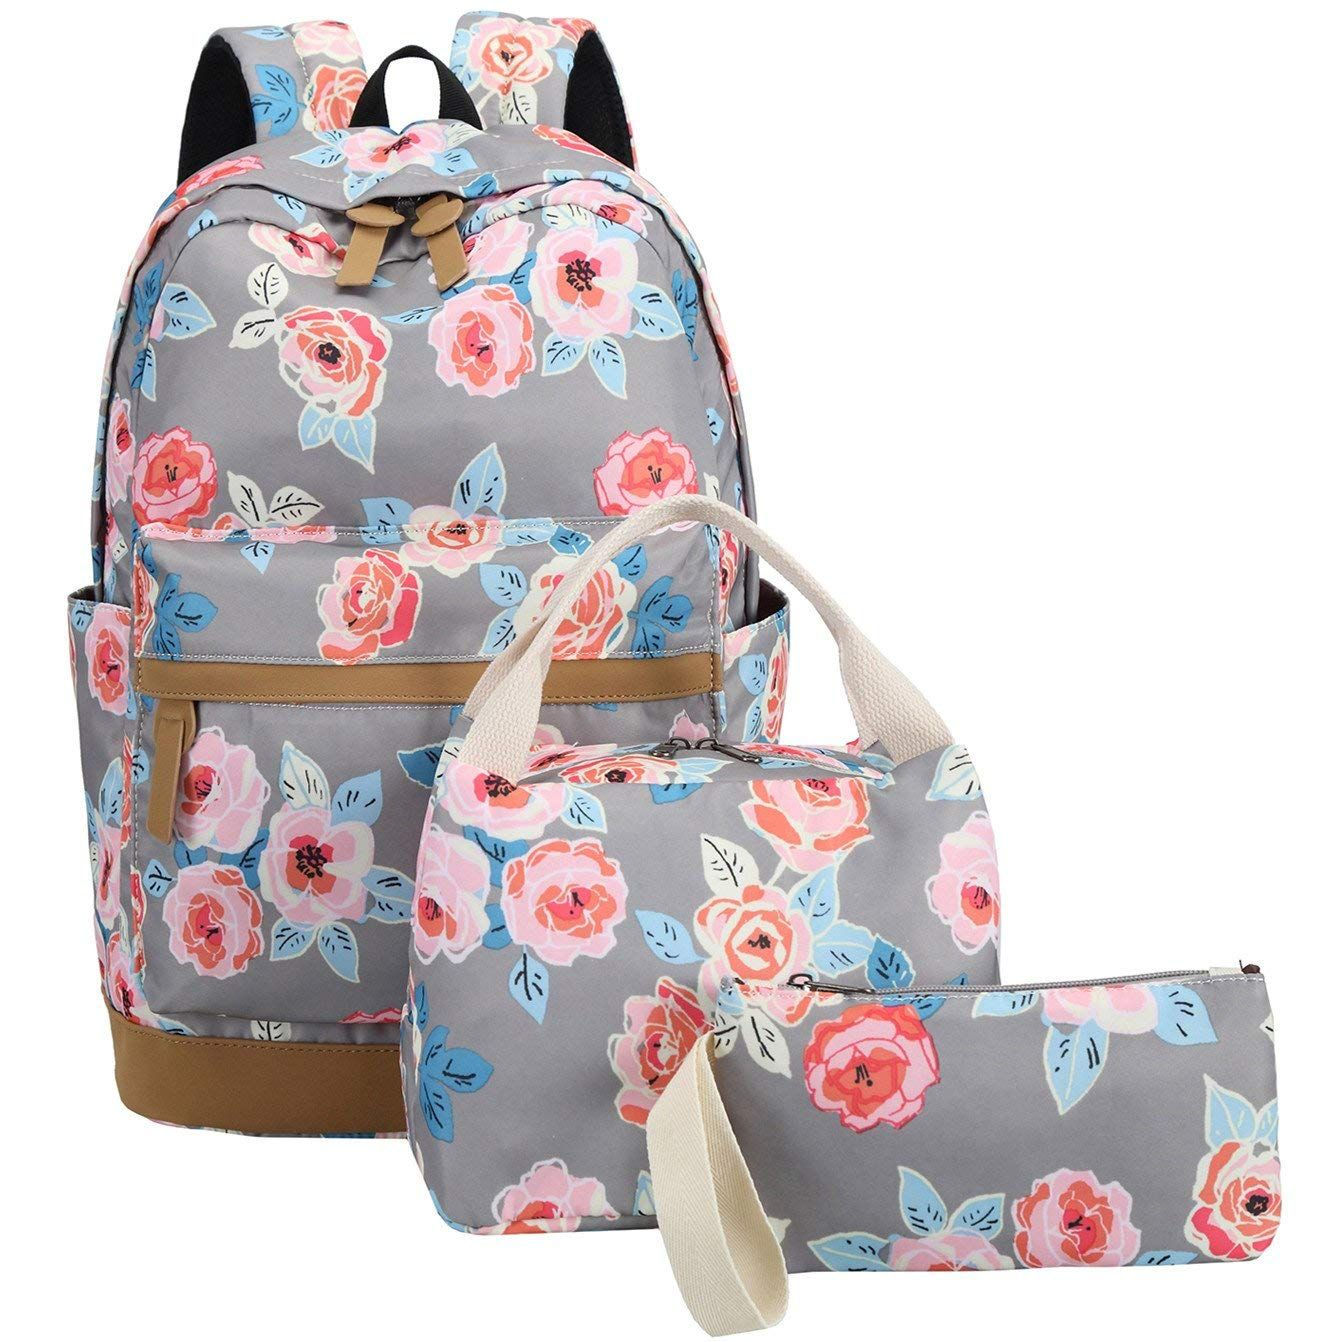 2781349e54a3 BLUBOON Teens Backpack Set Girls Women School Bags Laptop Rucksack Bookbags  3 in 1 (Gray